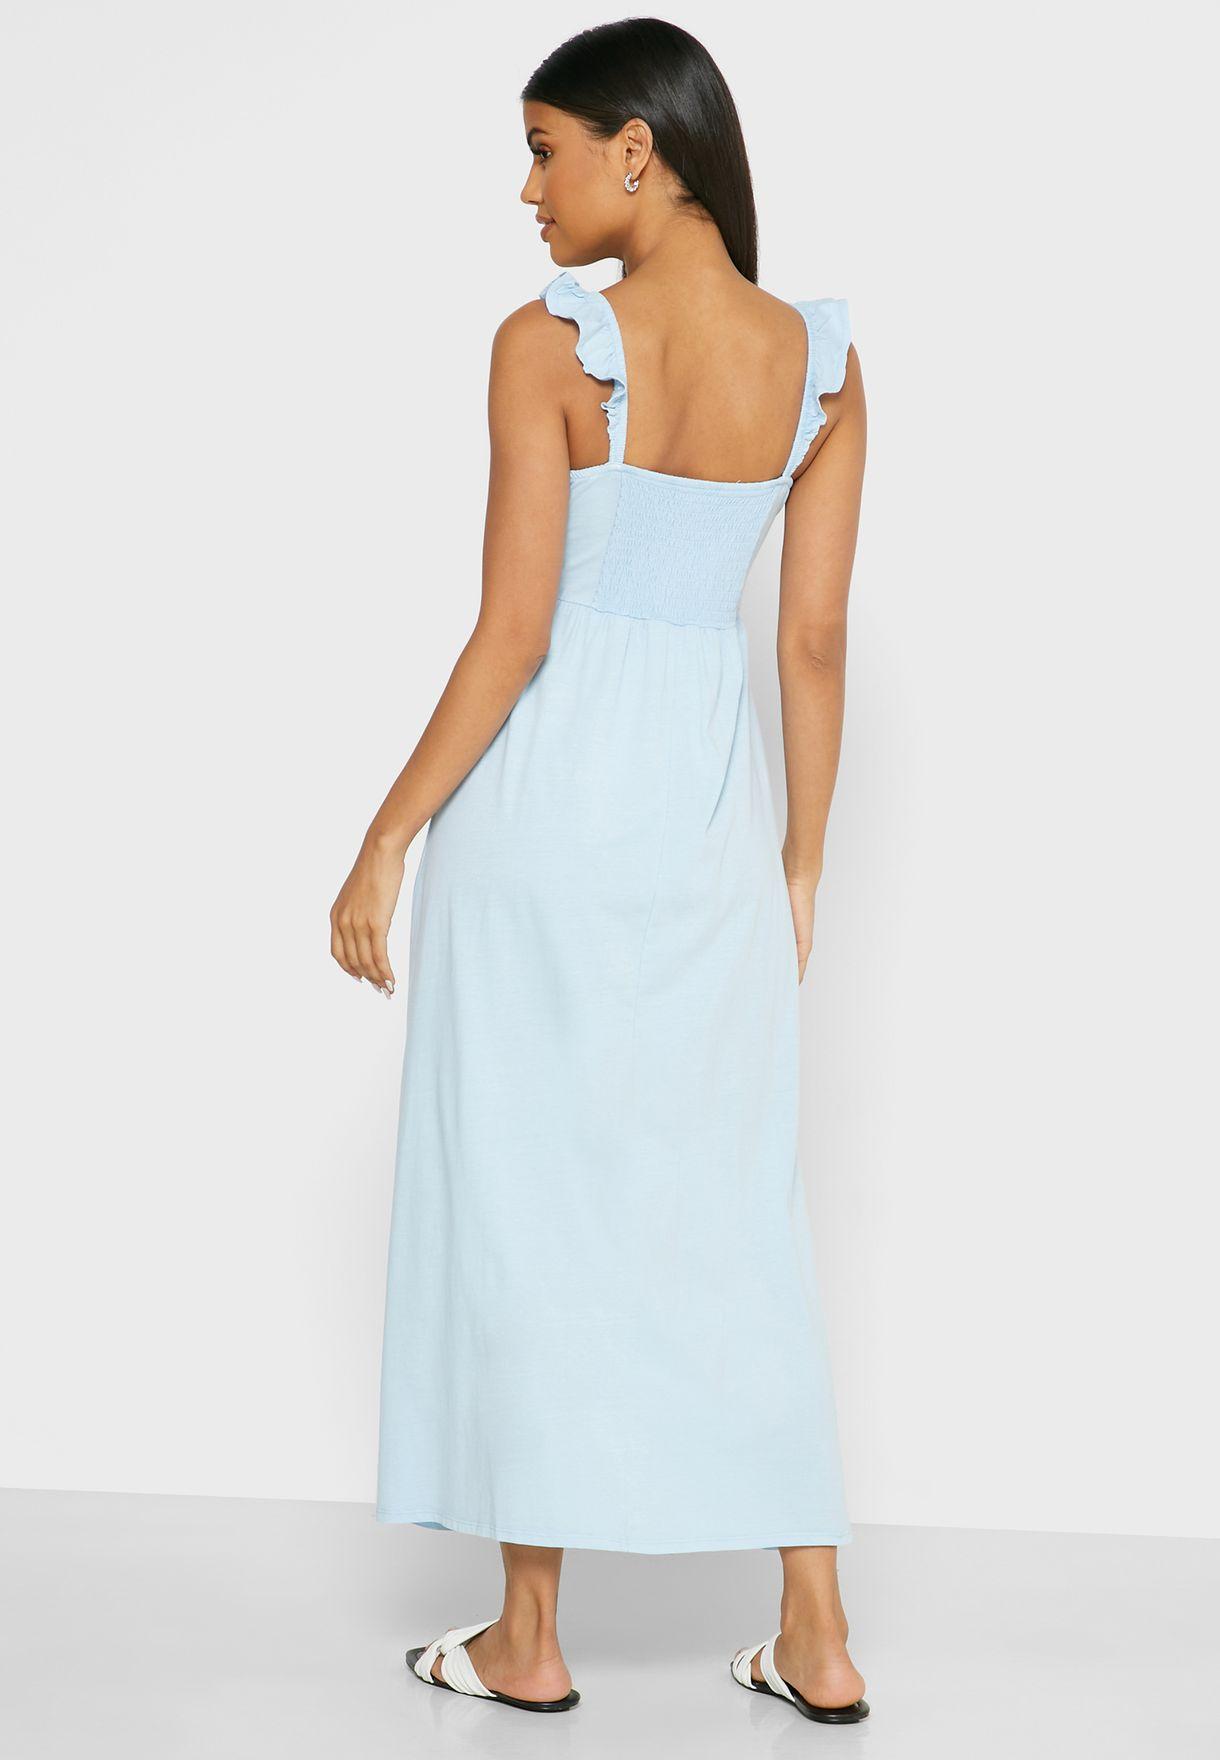 Cotton On Shirred Detail Cami Dress - Women Clothing kHOW8